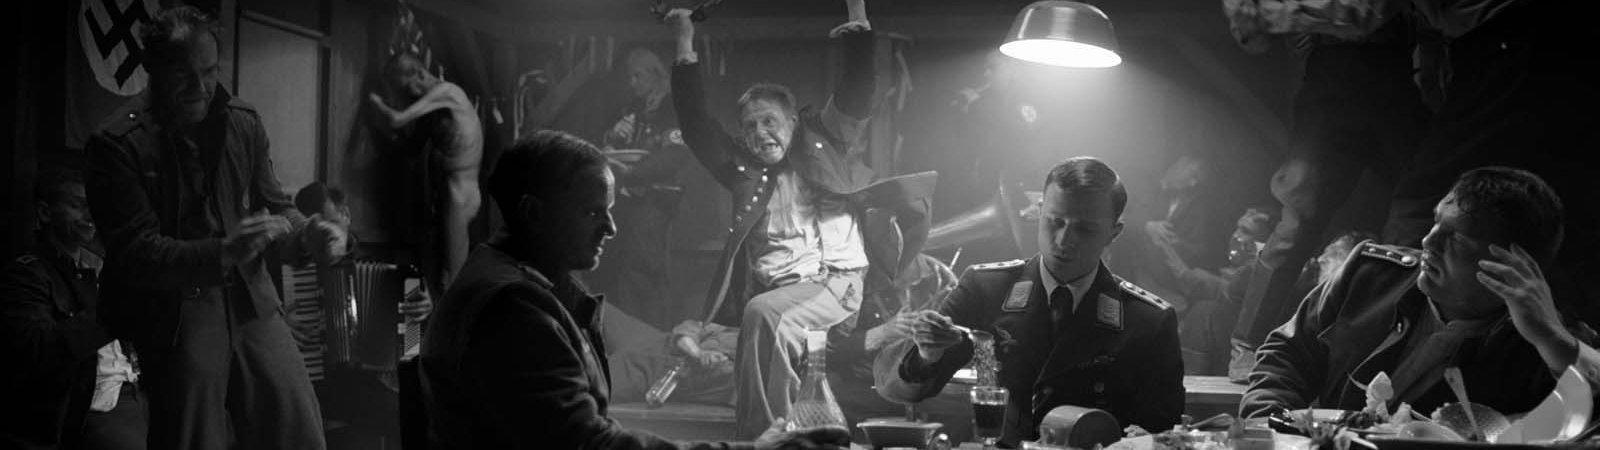 Photo dernier film Robert Schwentke